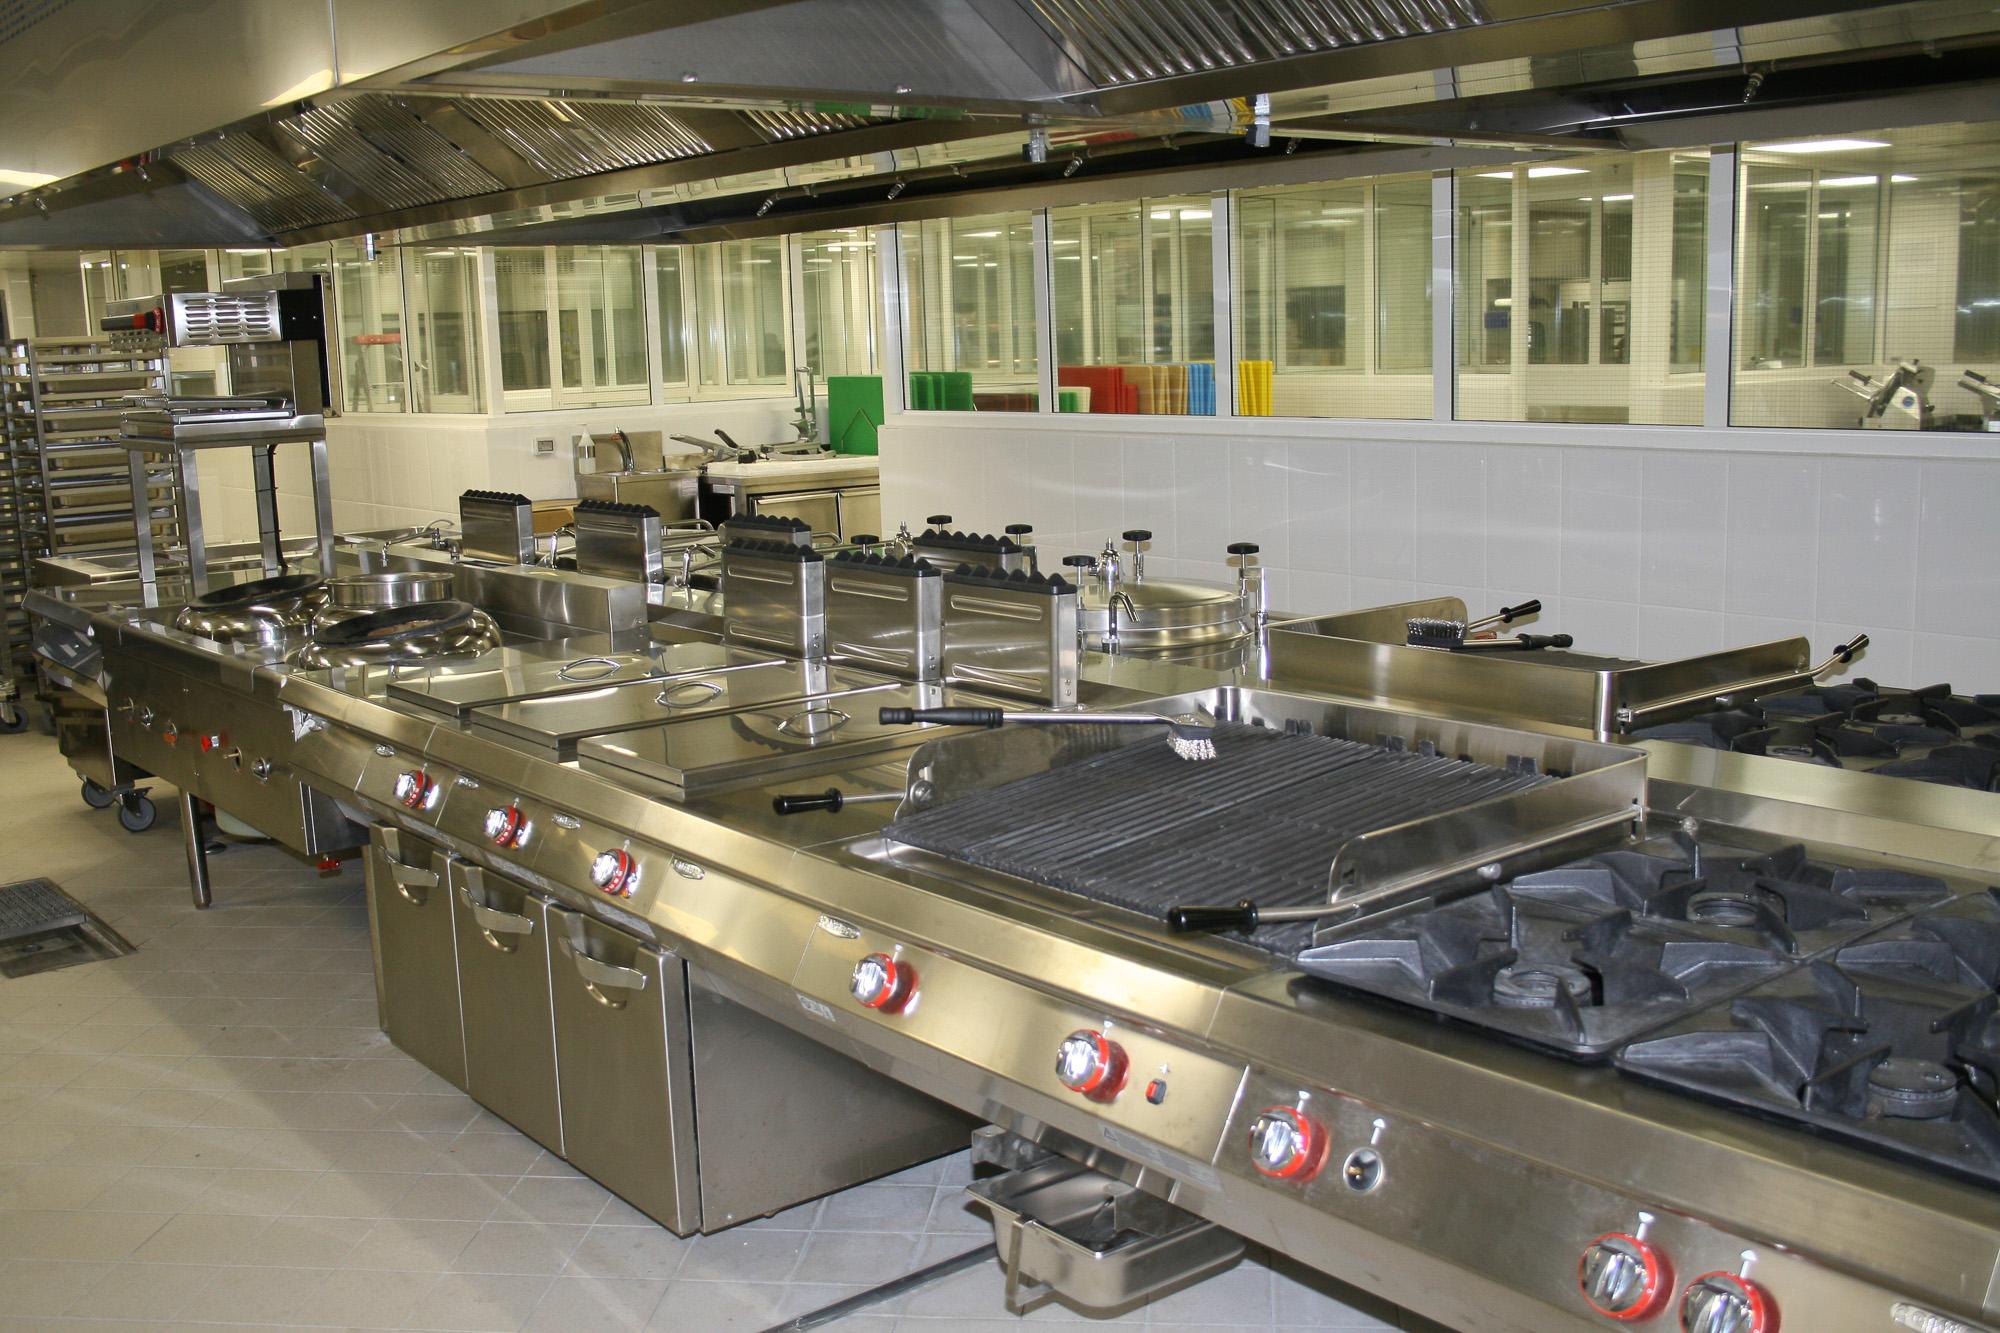 Italia_kitchen_-le_meridien_r-3